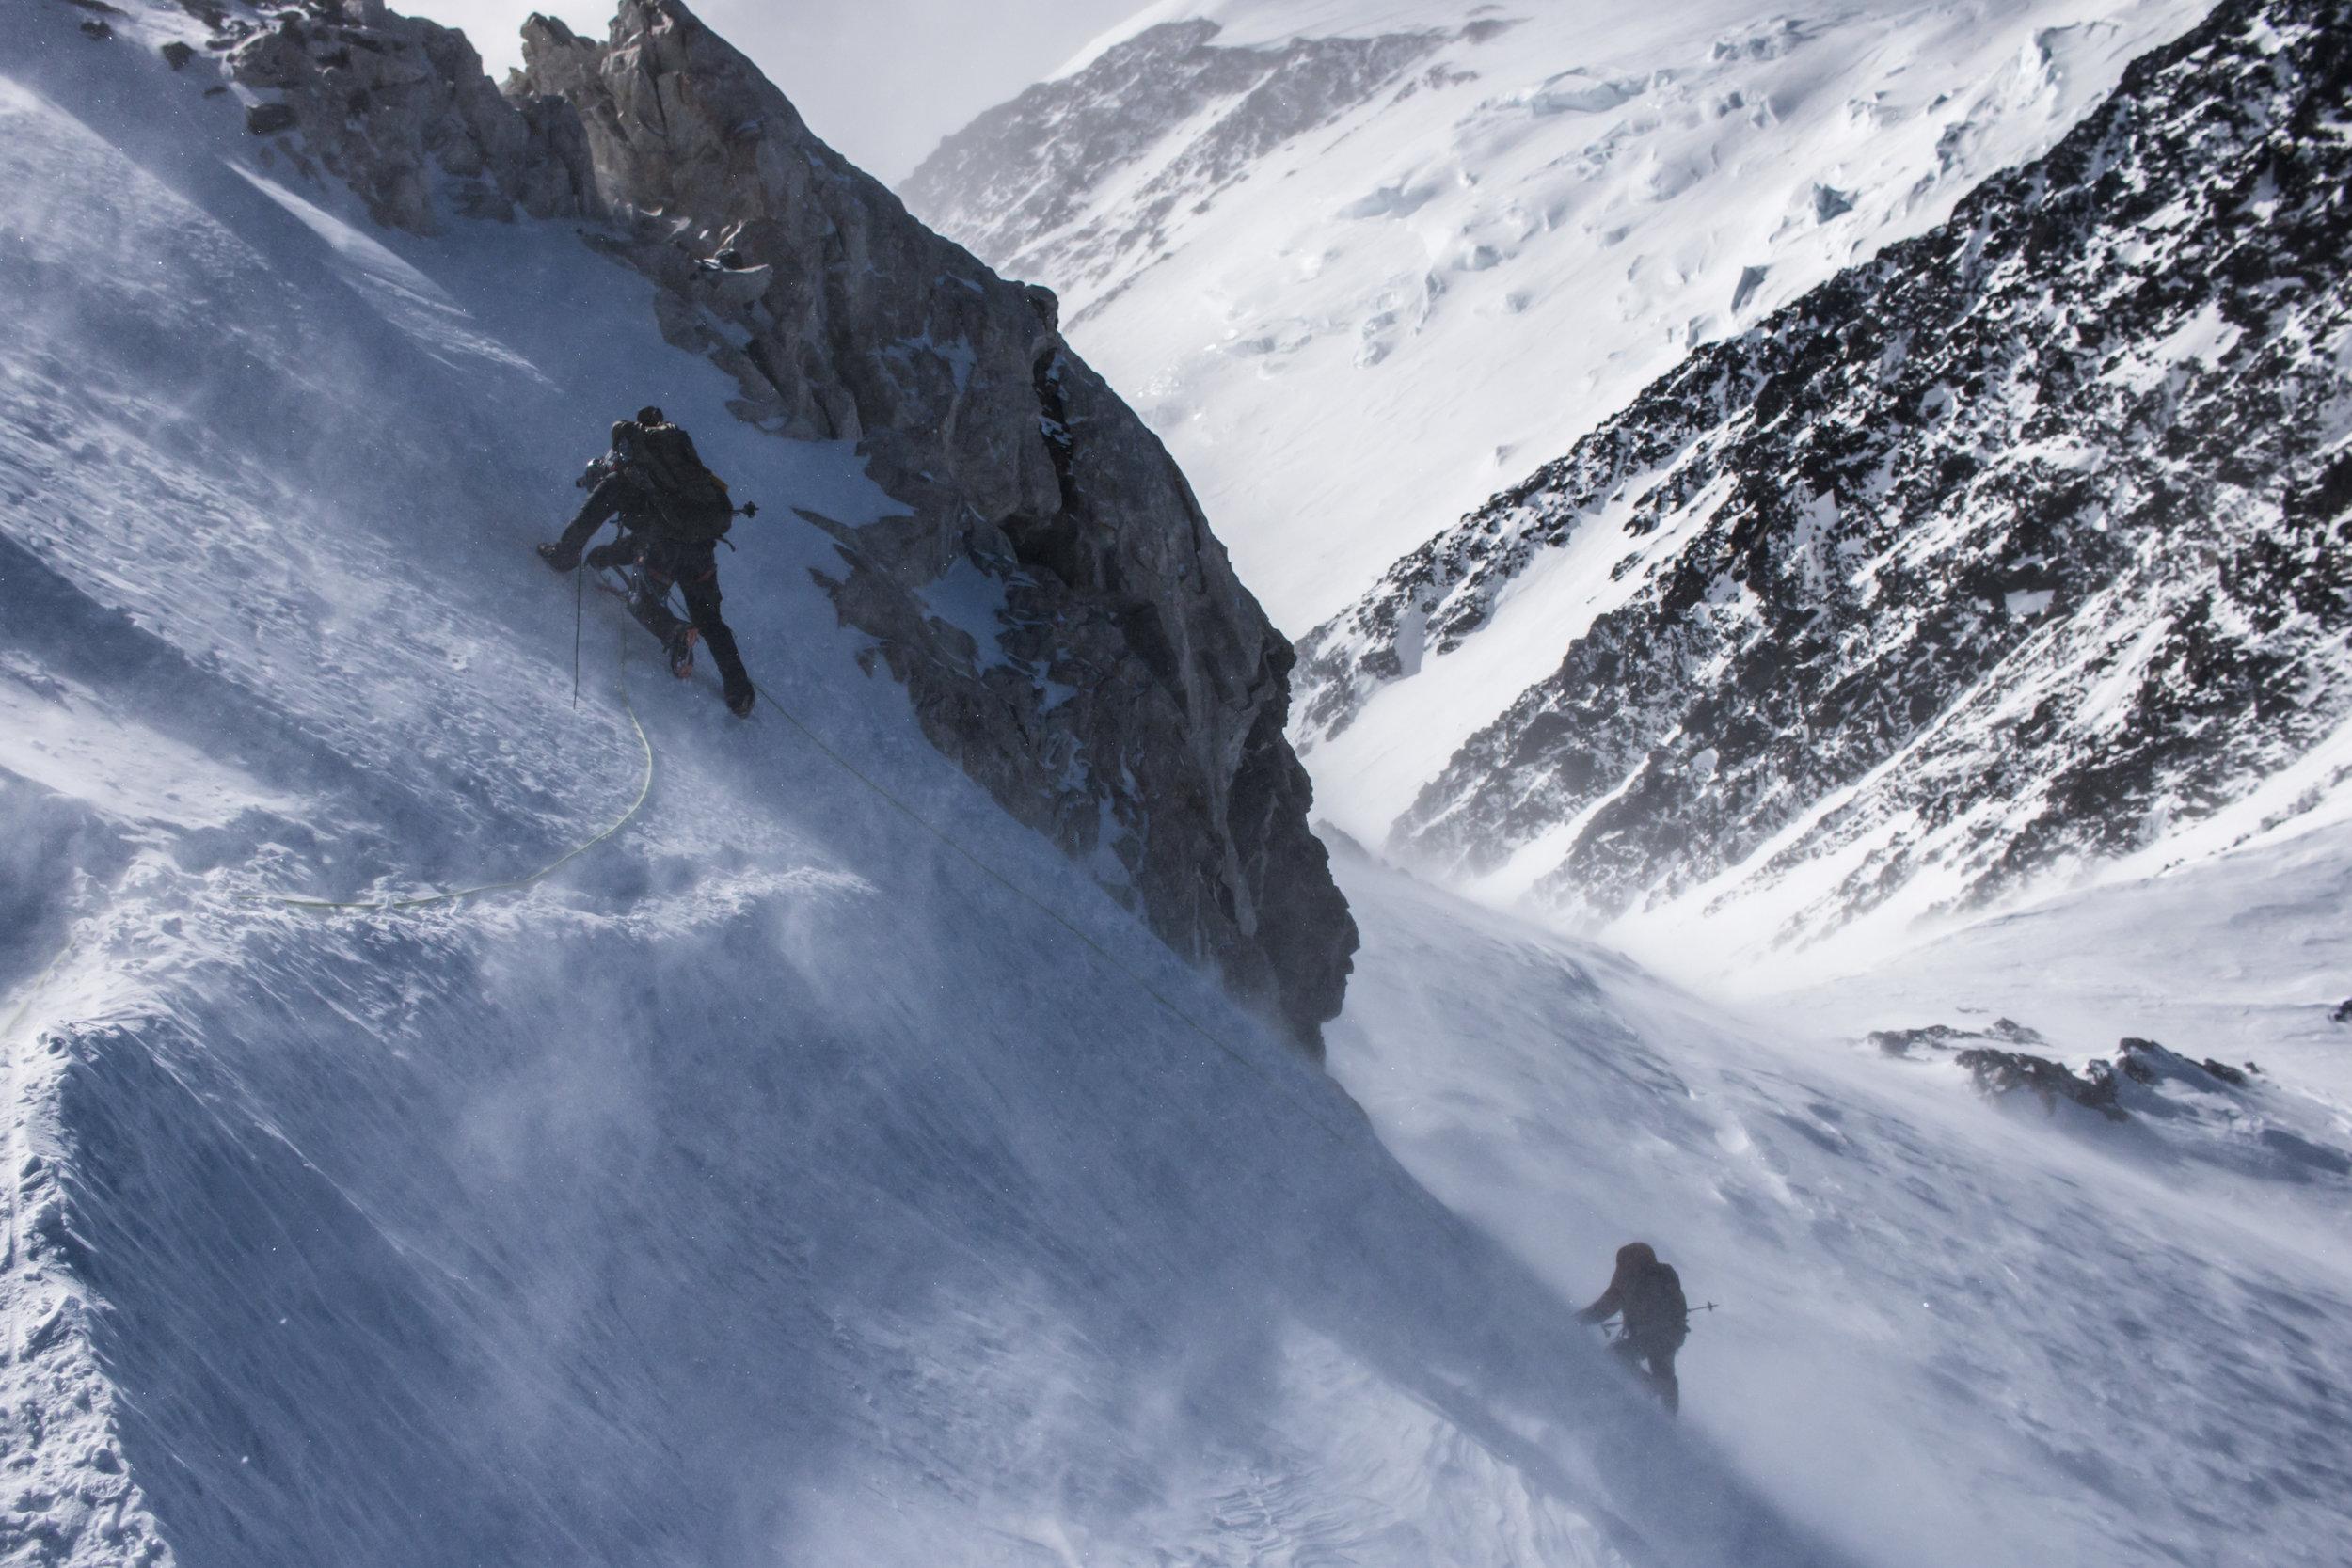 Down-climbing a steep section on Denali Pass.